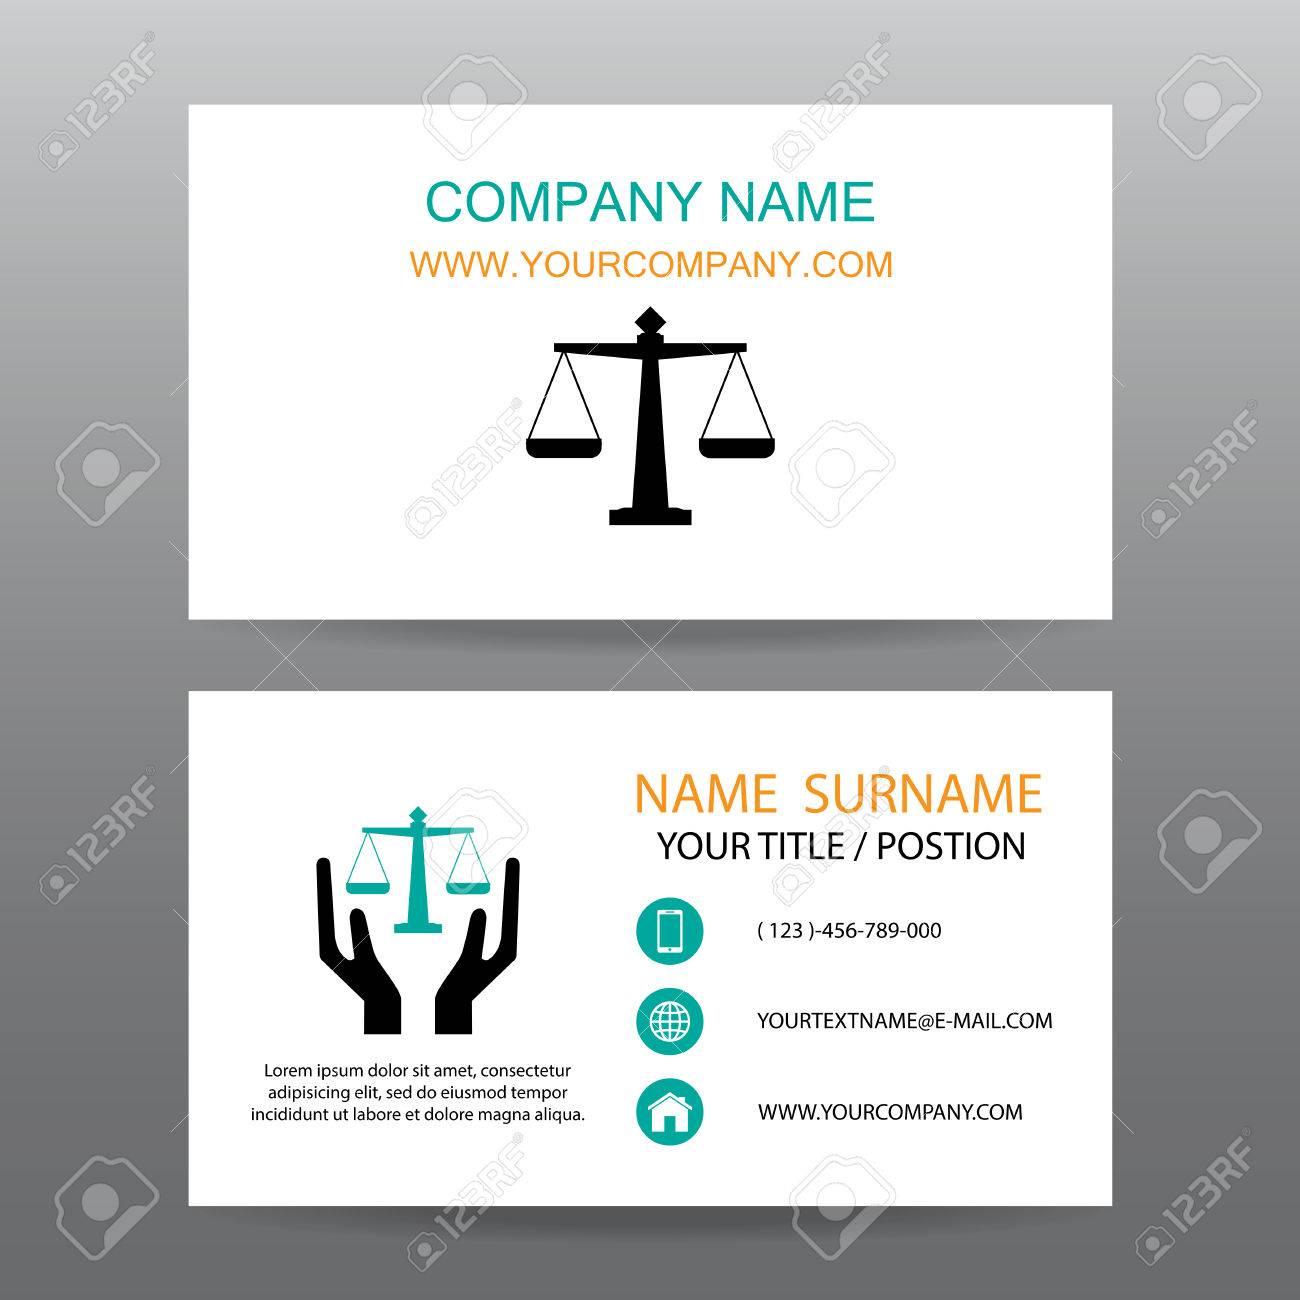 Business card vector backgroundinsurance law and lawyer royalty business card vector backgroundinsurance law and lawyer stock vector 38621011 colourmoves